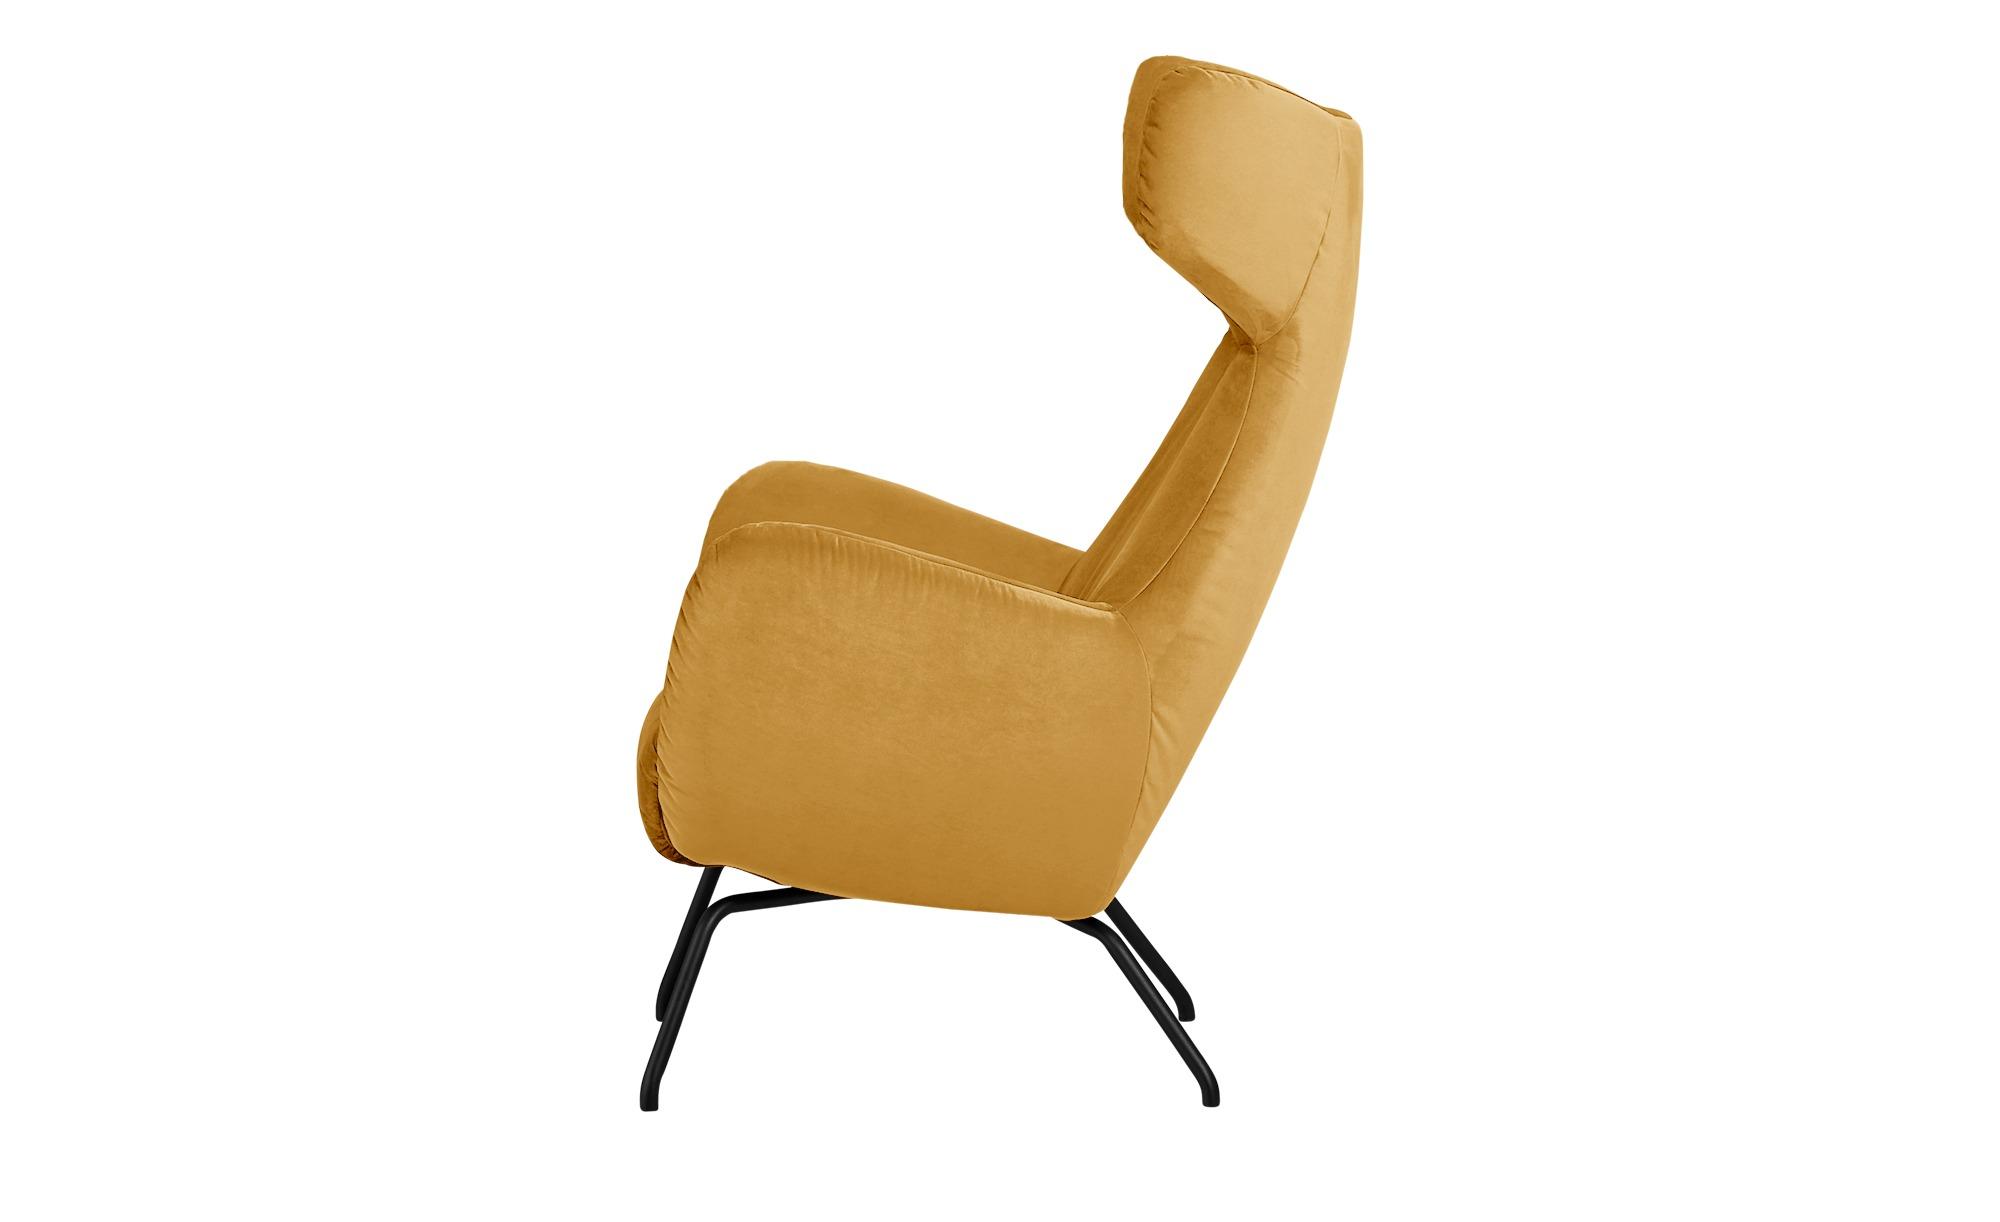 pop Sessel  Corelli ¦ gelb ¦ Maße (cm): B: 79 H: 117 T: 82 Polstermöbel > Sessel > Polstersessel - Höffner